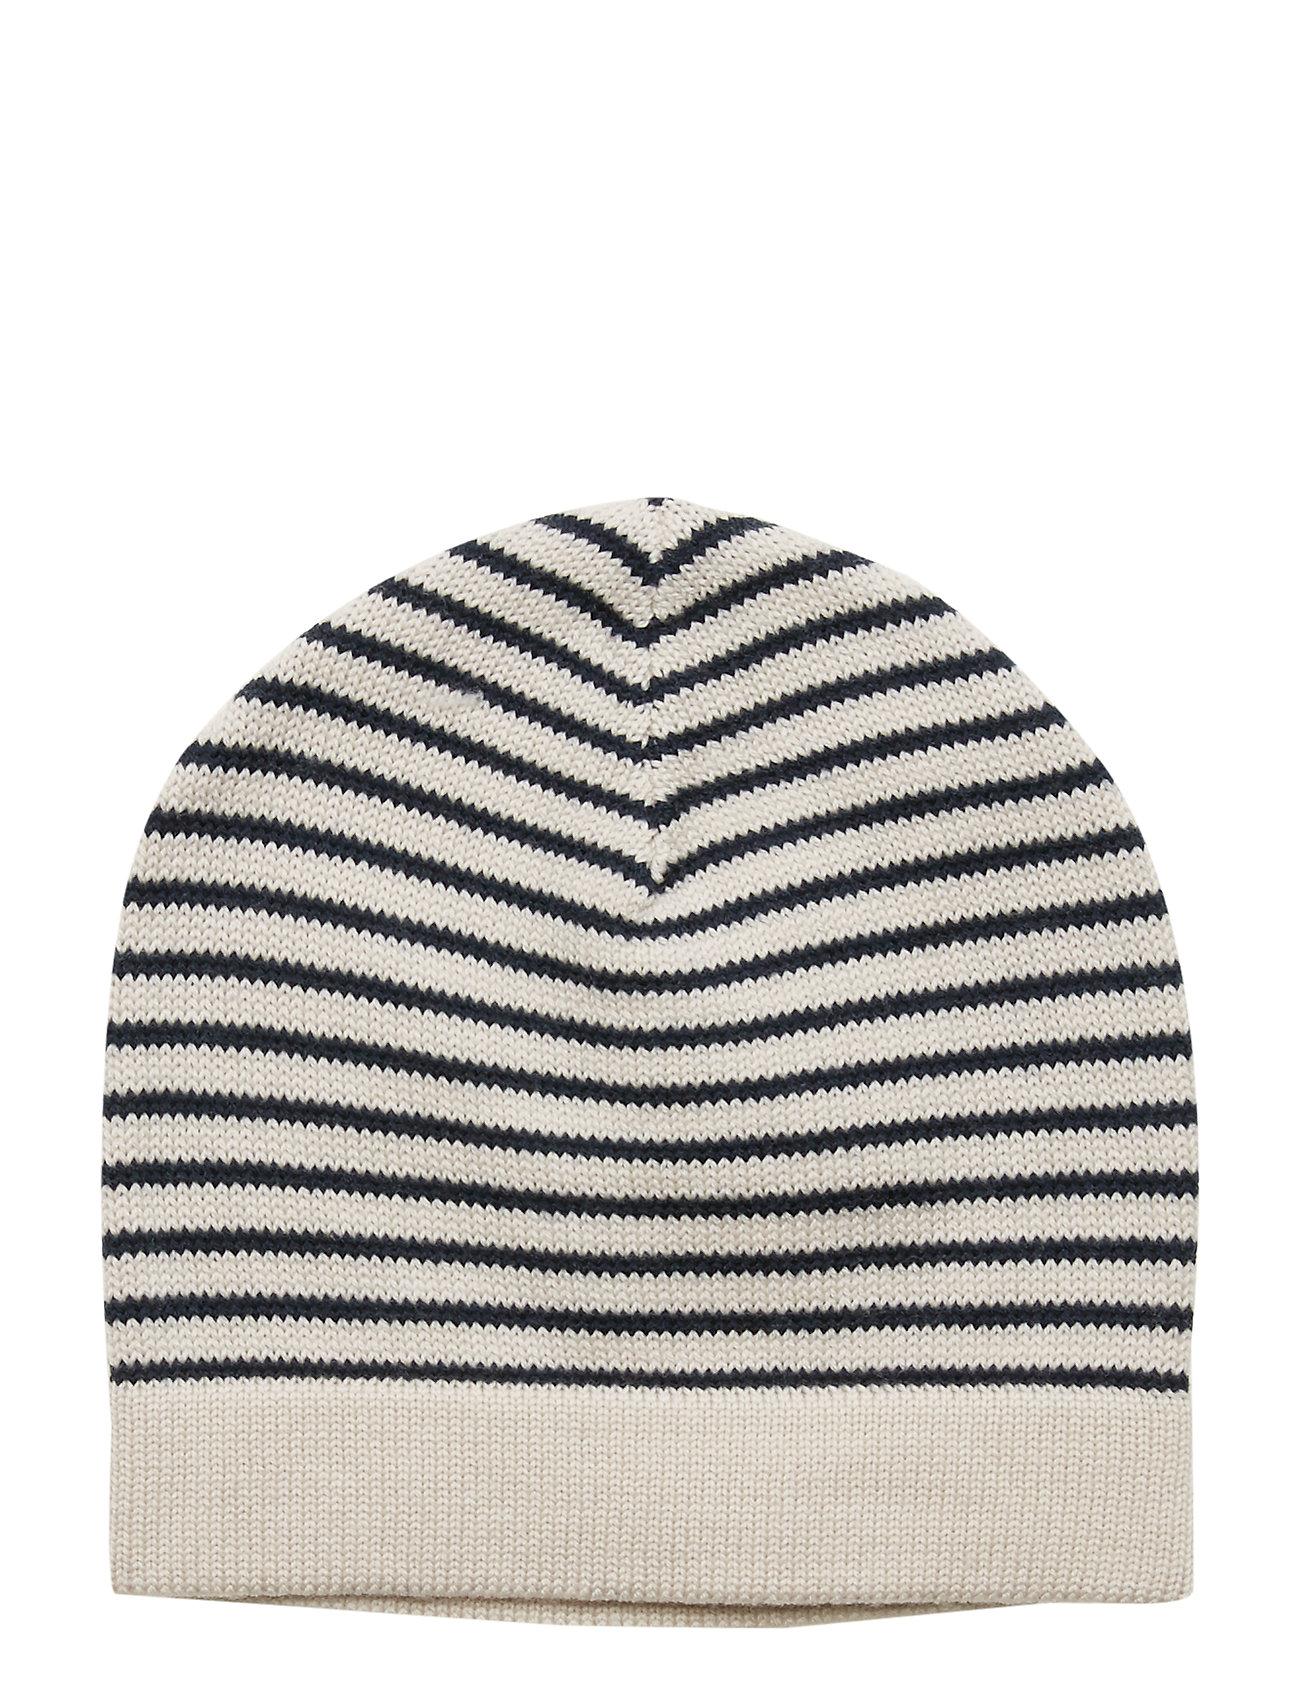 FUB Hat - ECRU/NAVY